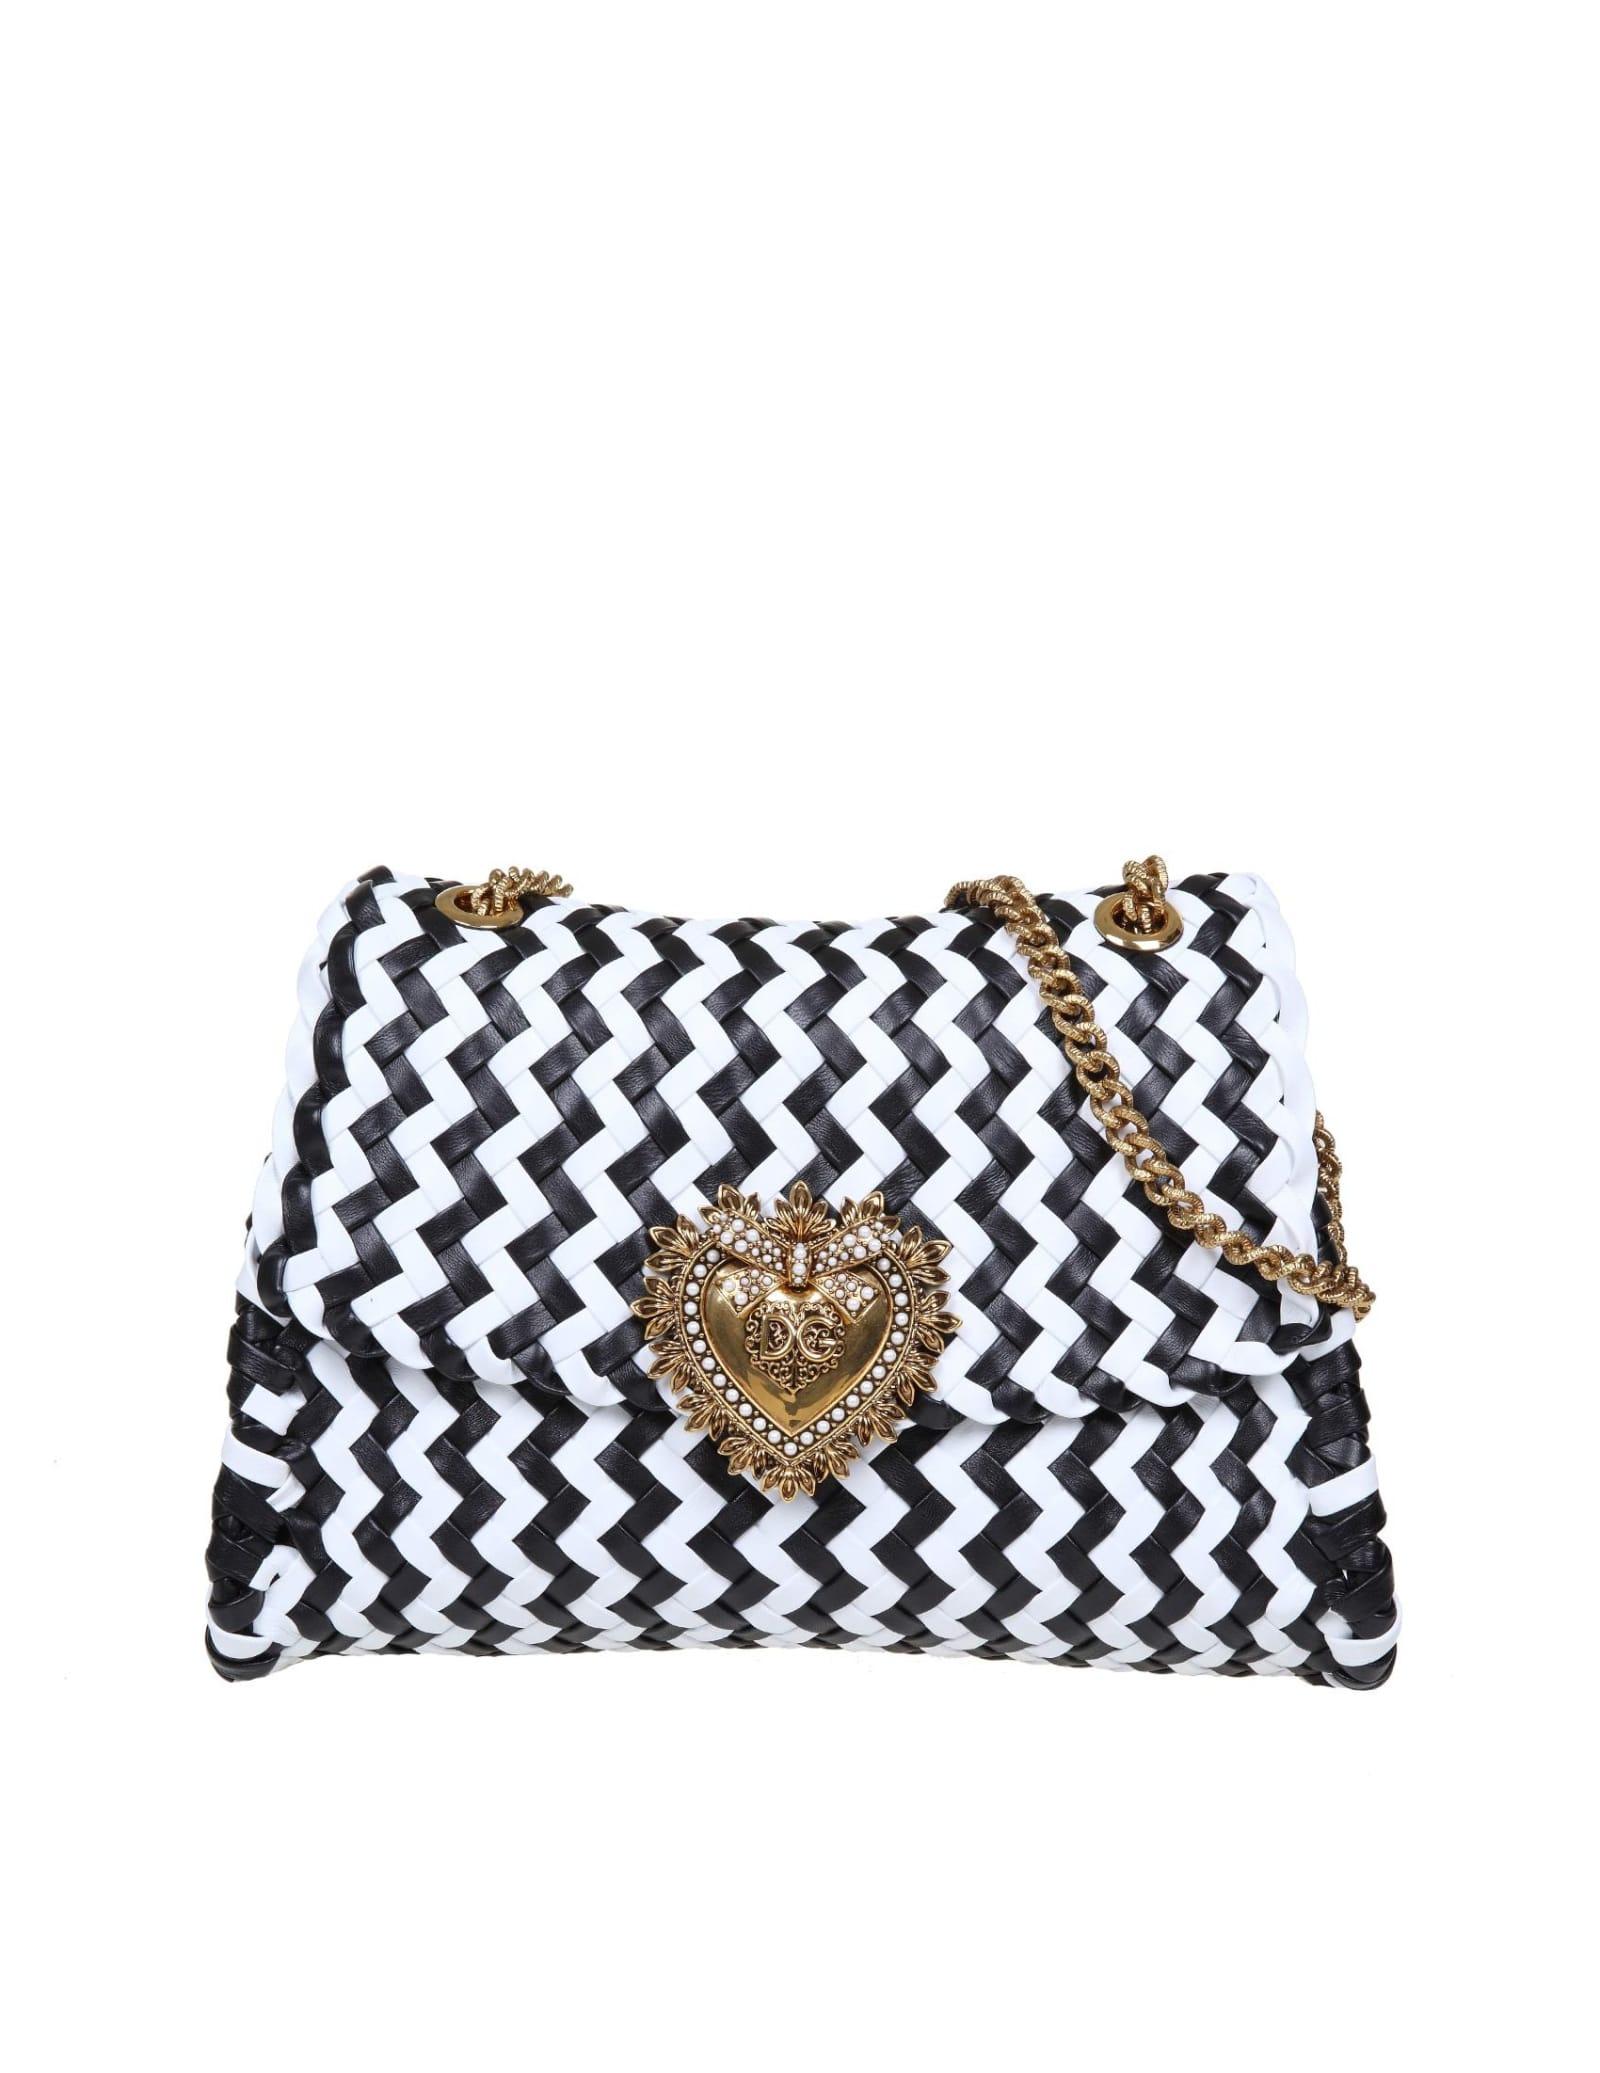 Dolce & Gabbana DEVOTION SHOULDER BAG IN WOVEN NAPPA